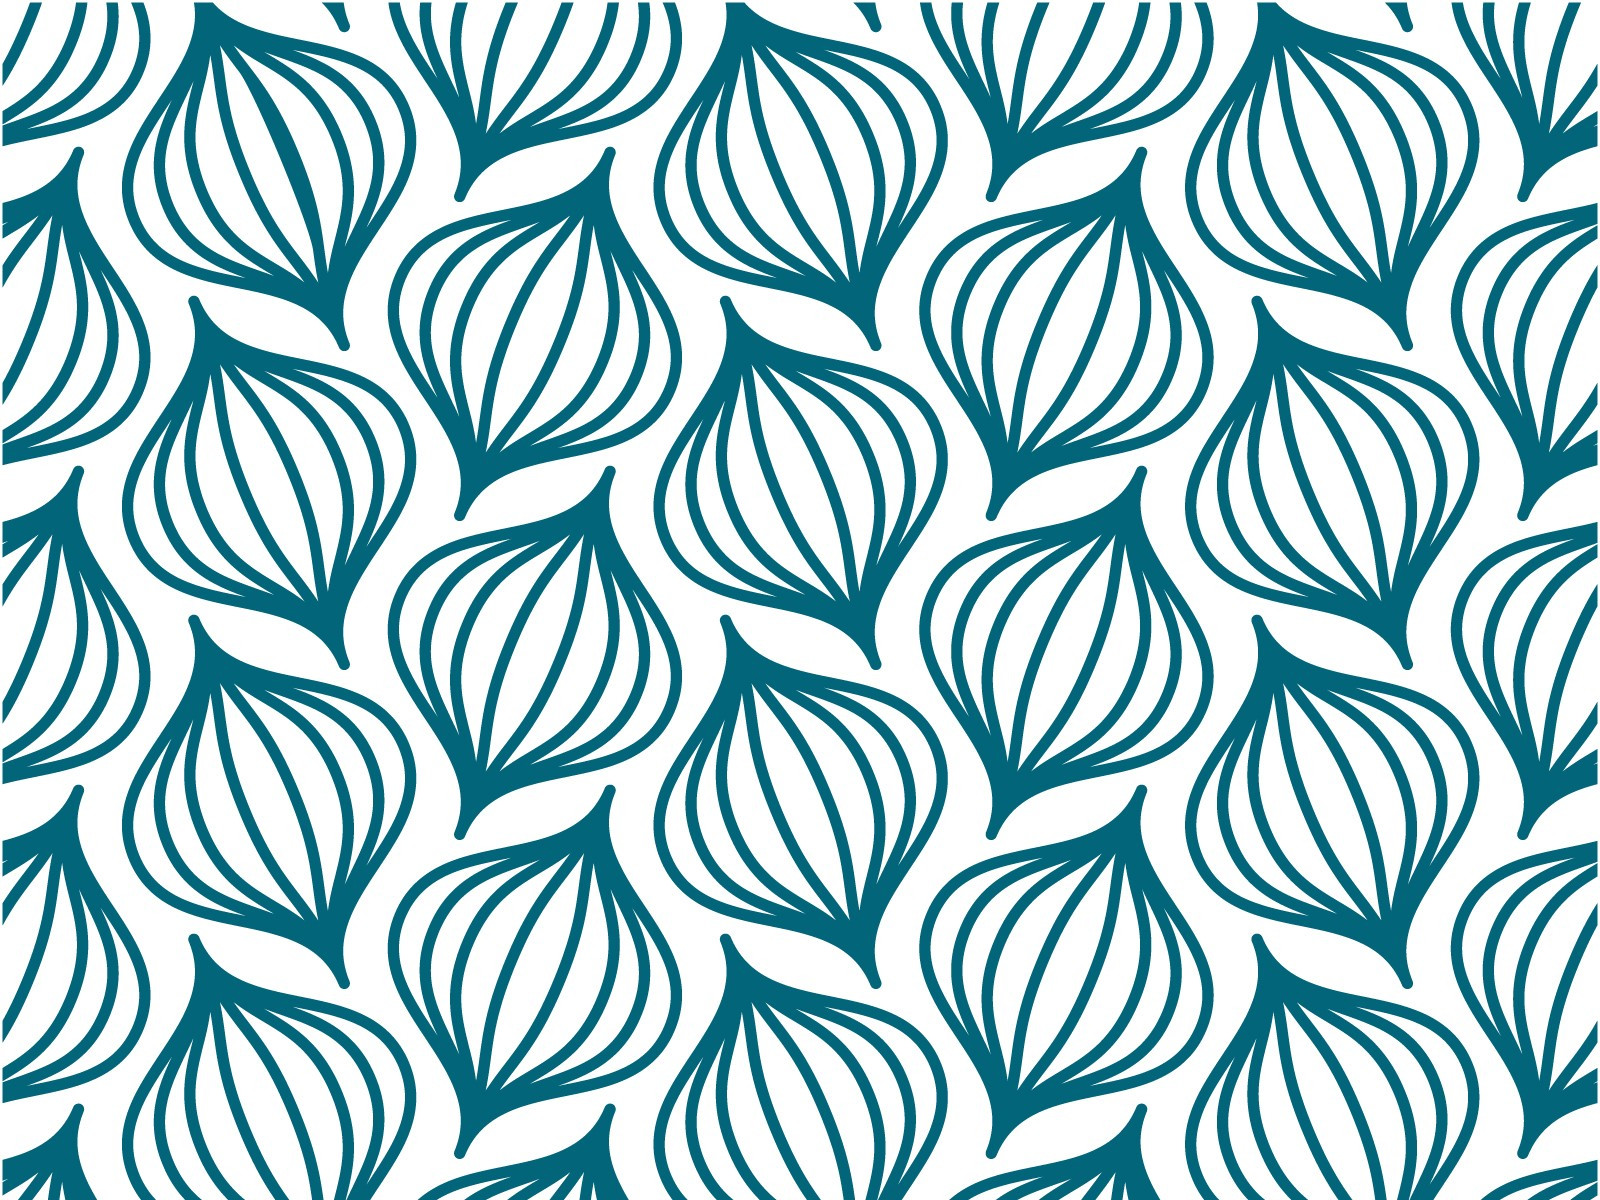 Papier Peint Adhesif Scandinave Modele Lanternes Bleu Canard